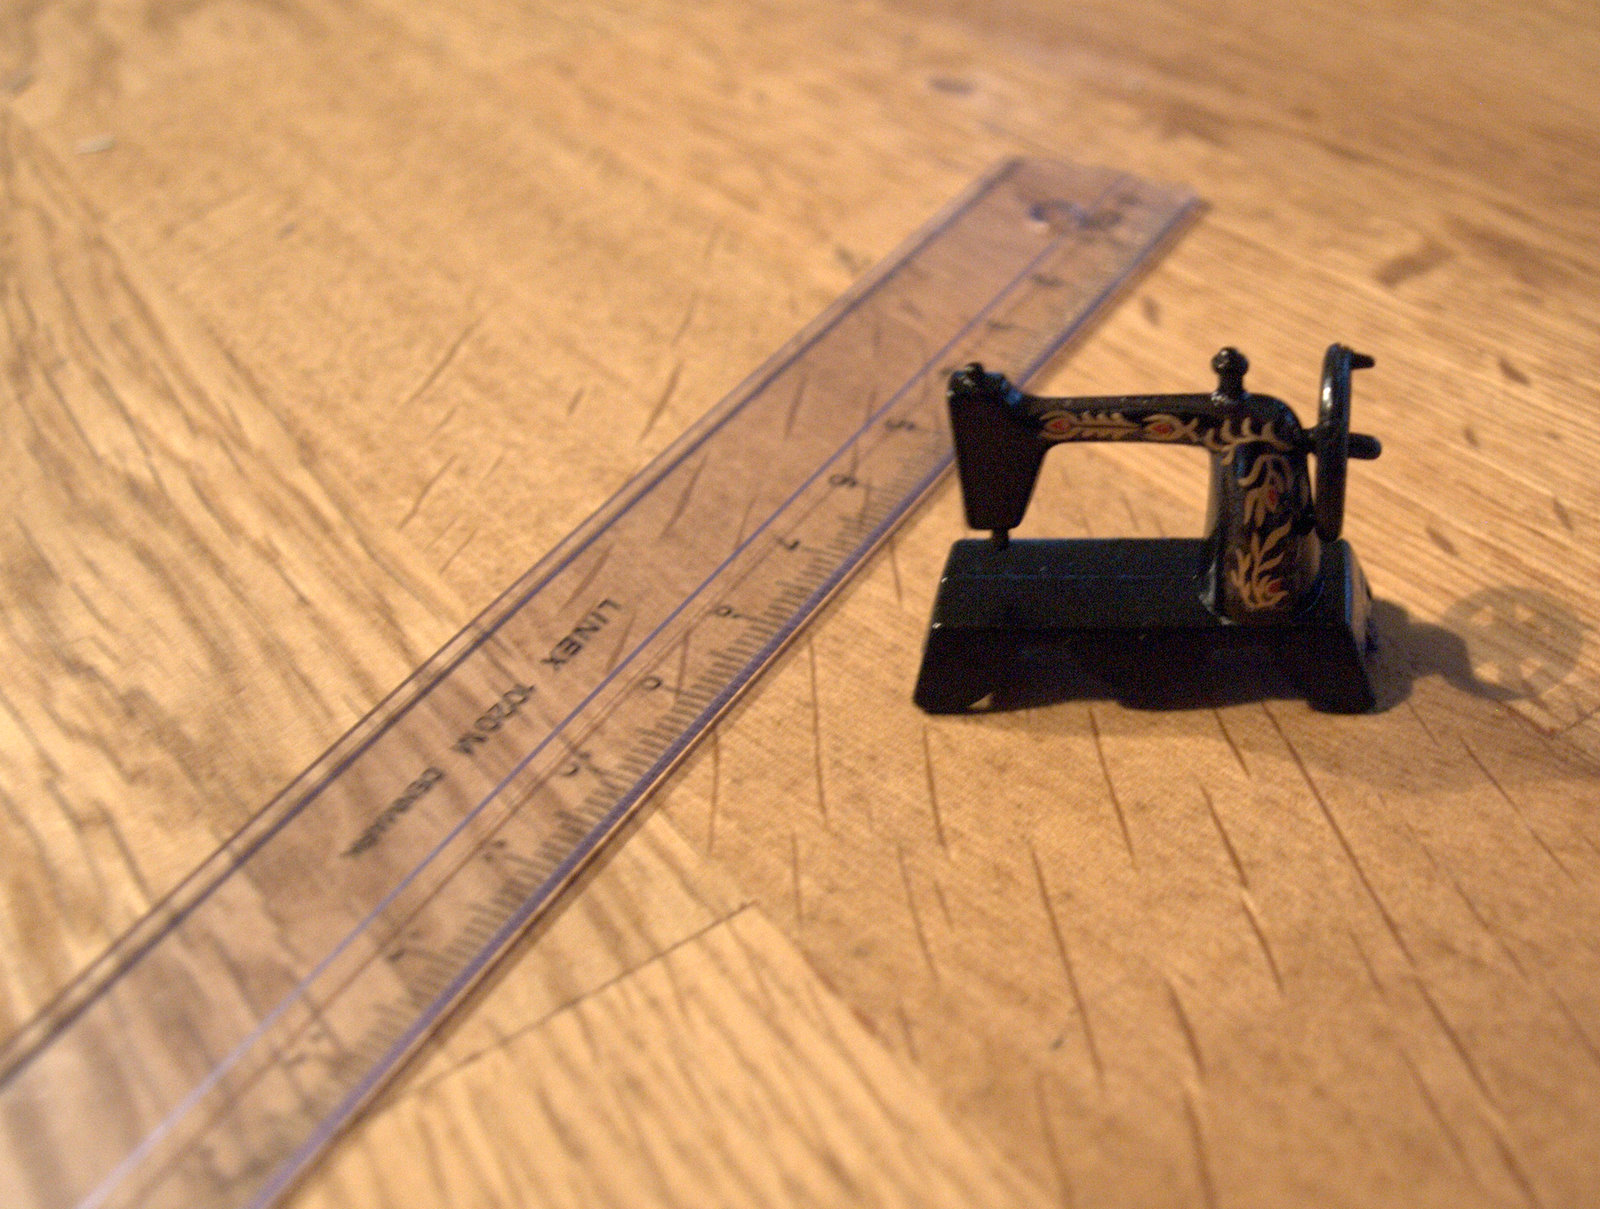 Mikrosymaskine